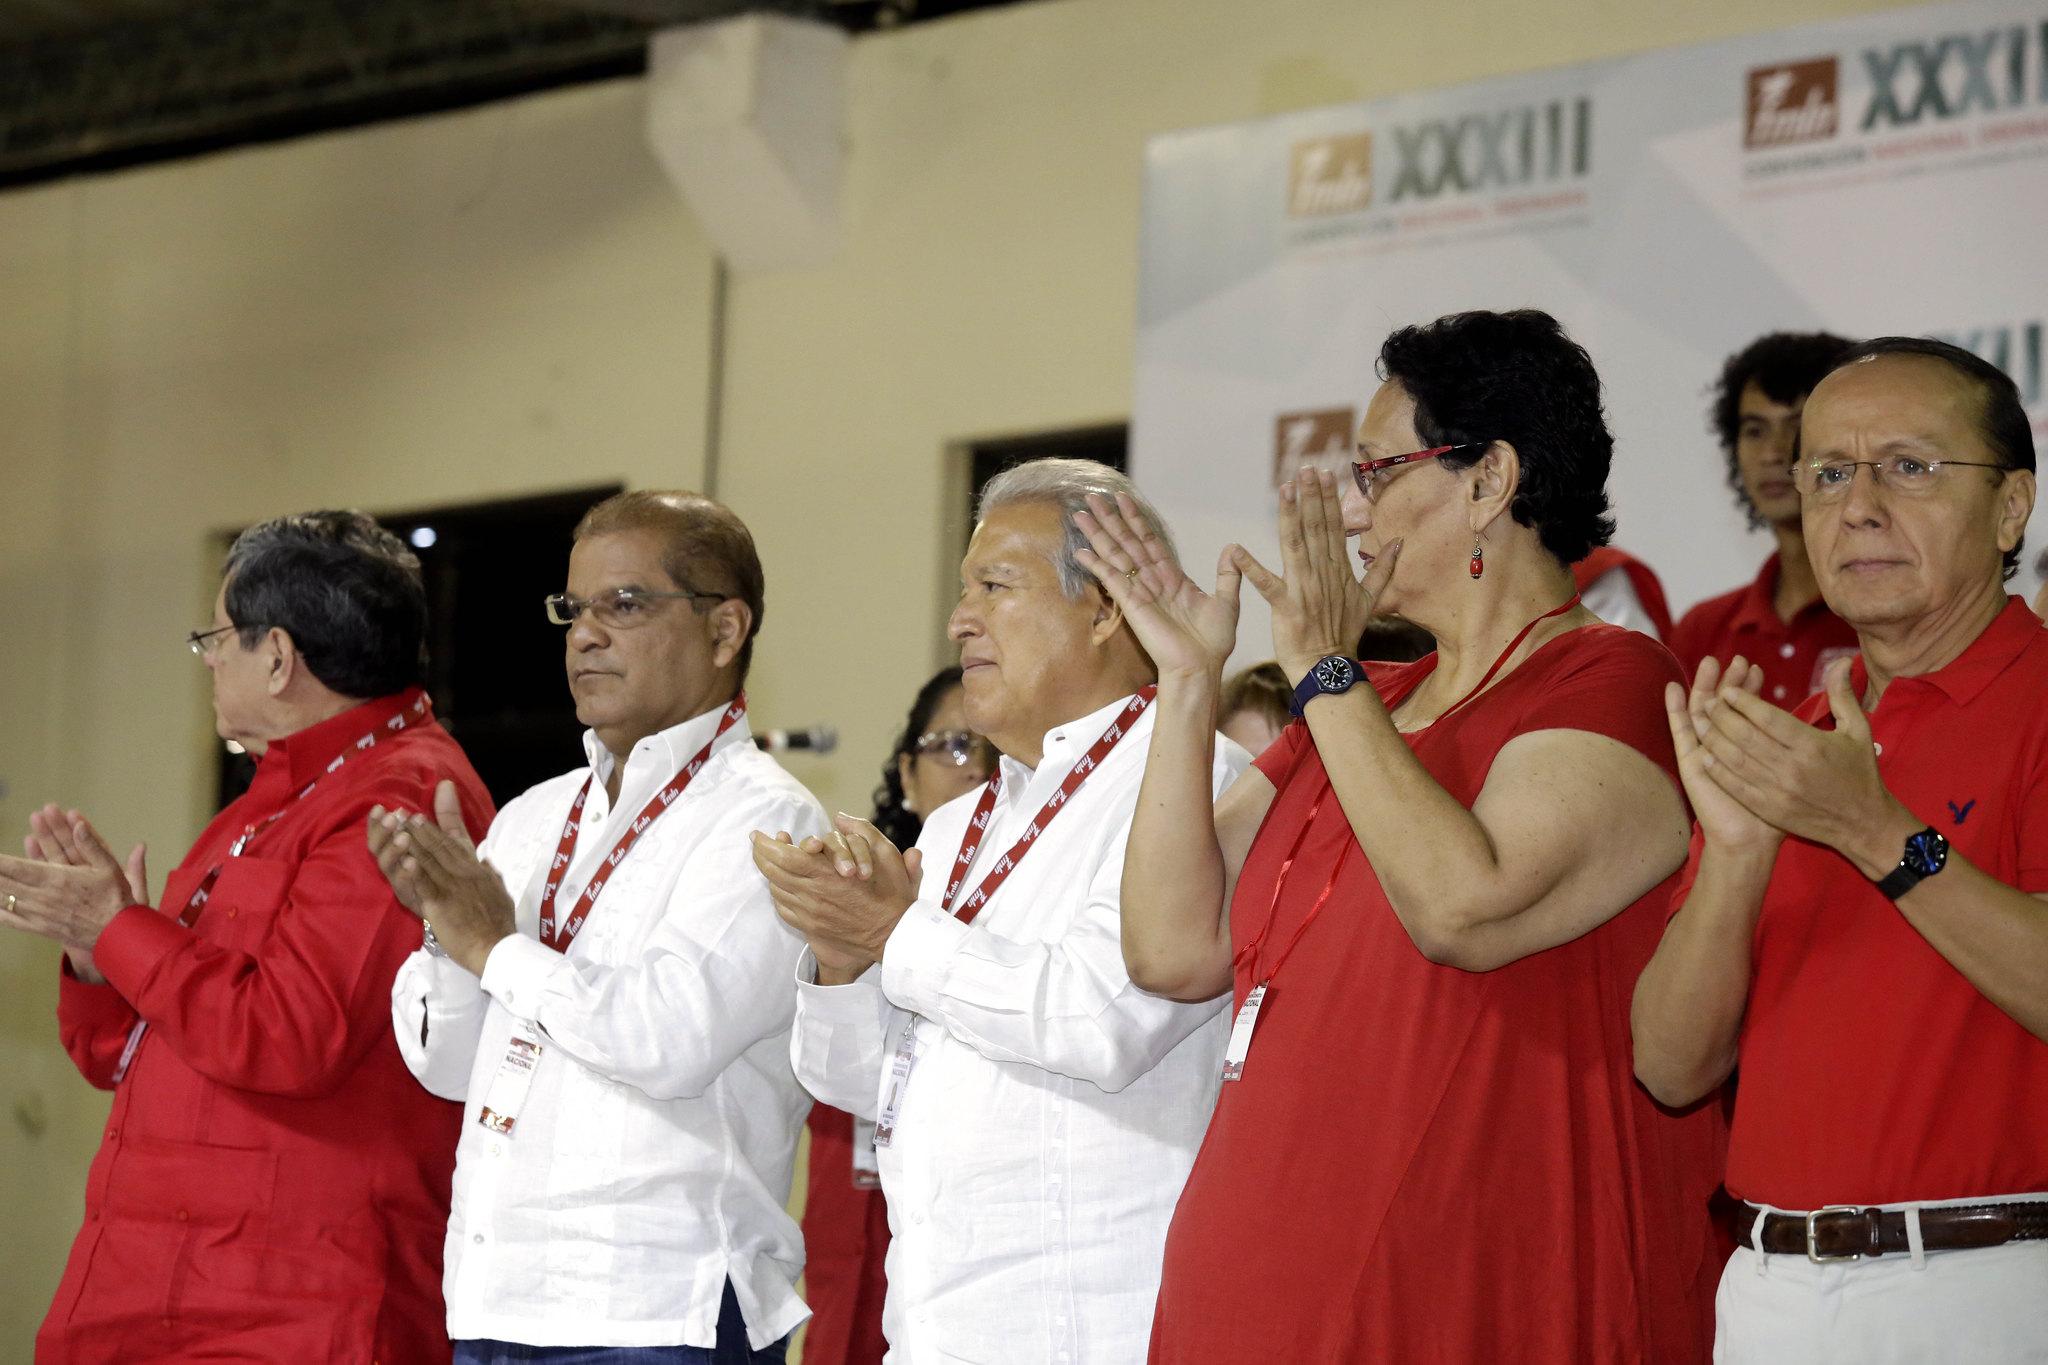 XXXIII Convención Nacional del FMLN